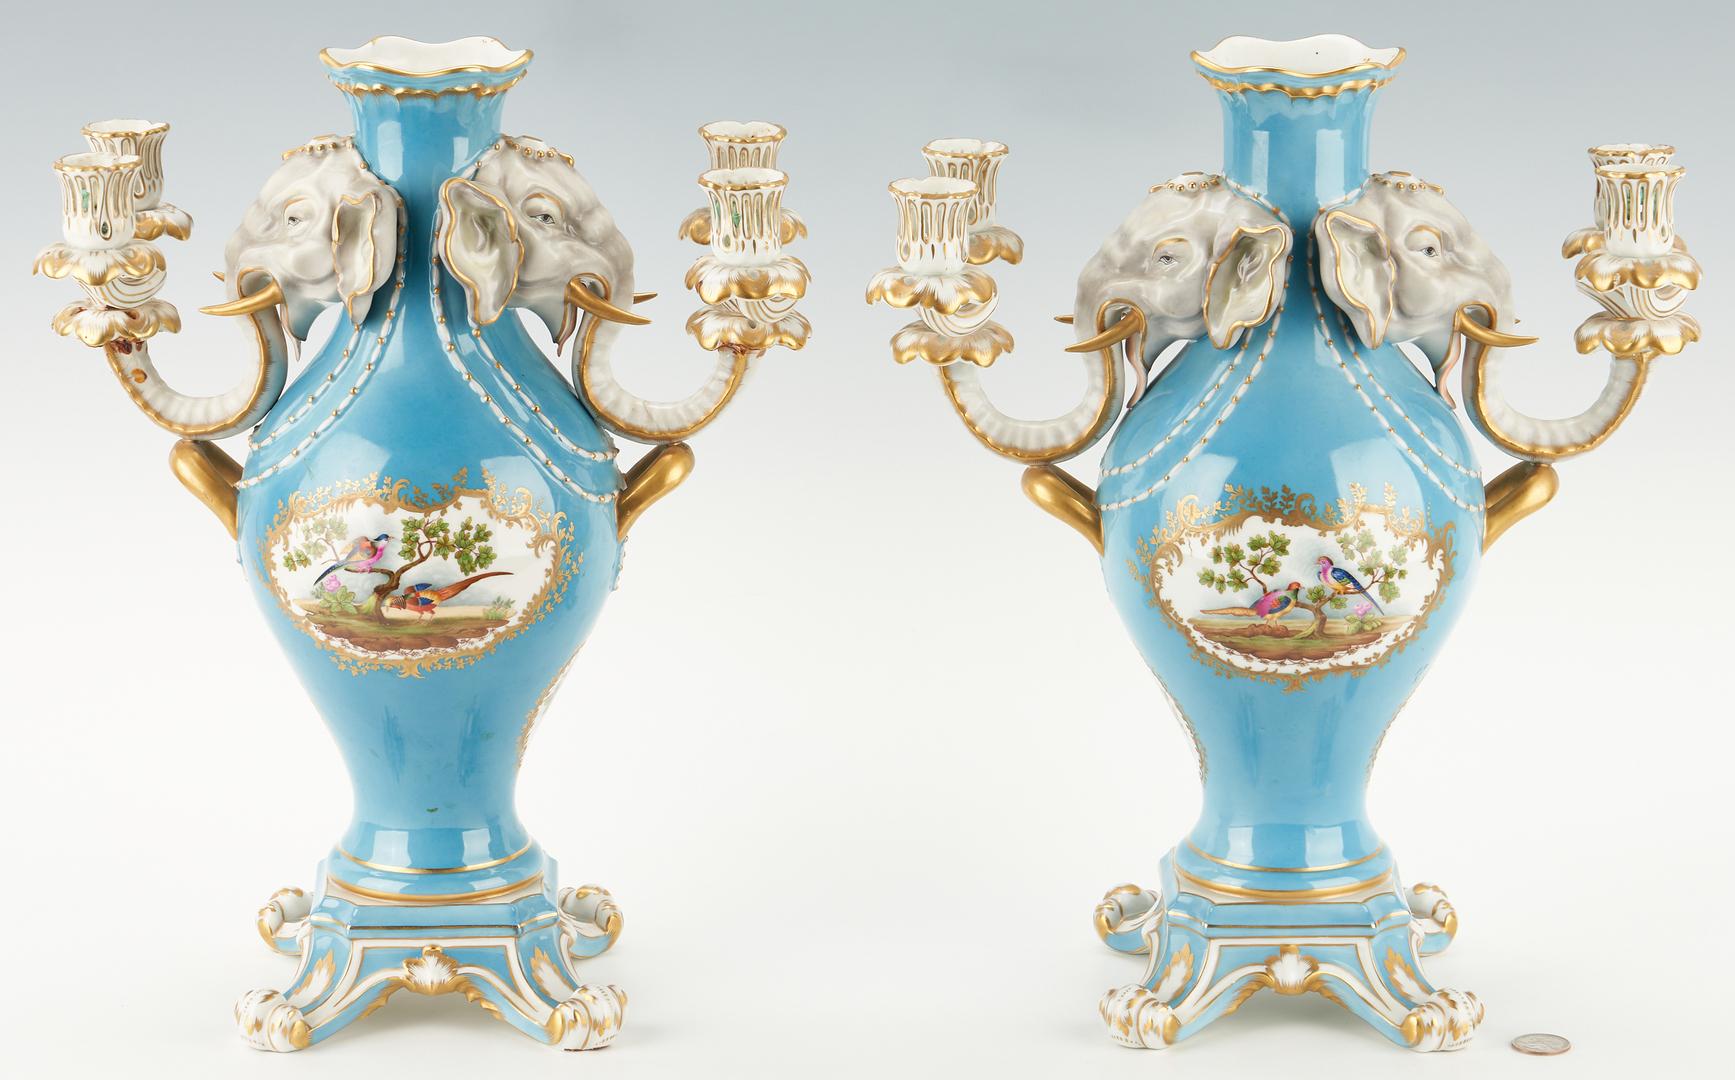 Lot 333: Pr. Sevres Style Candelabra Vases a Tete de Elephant